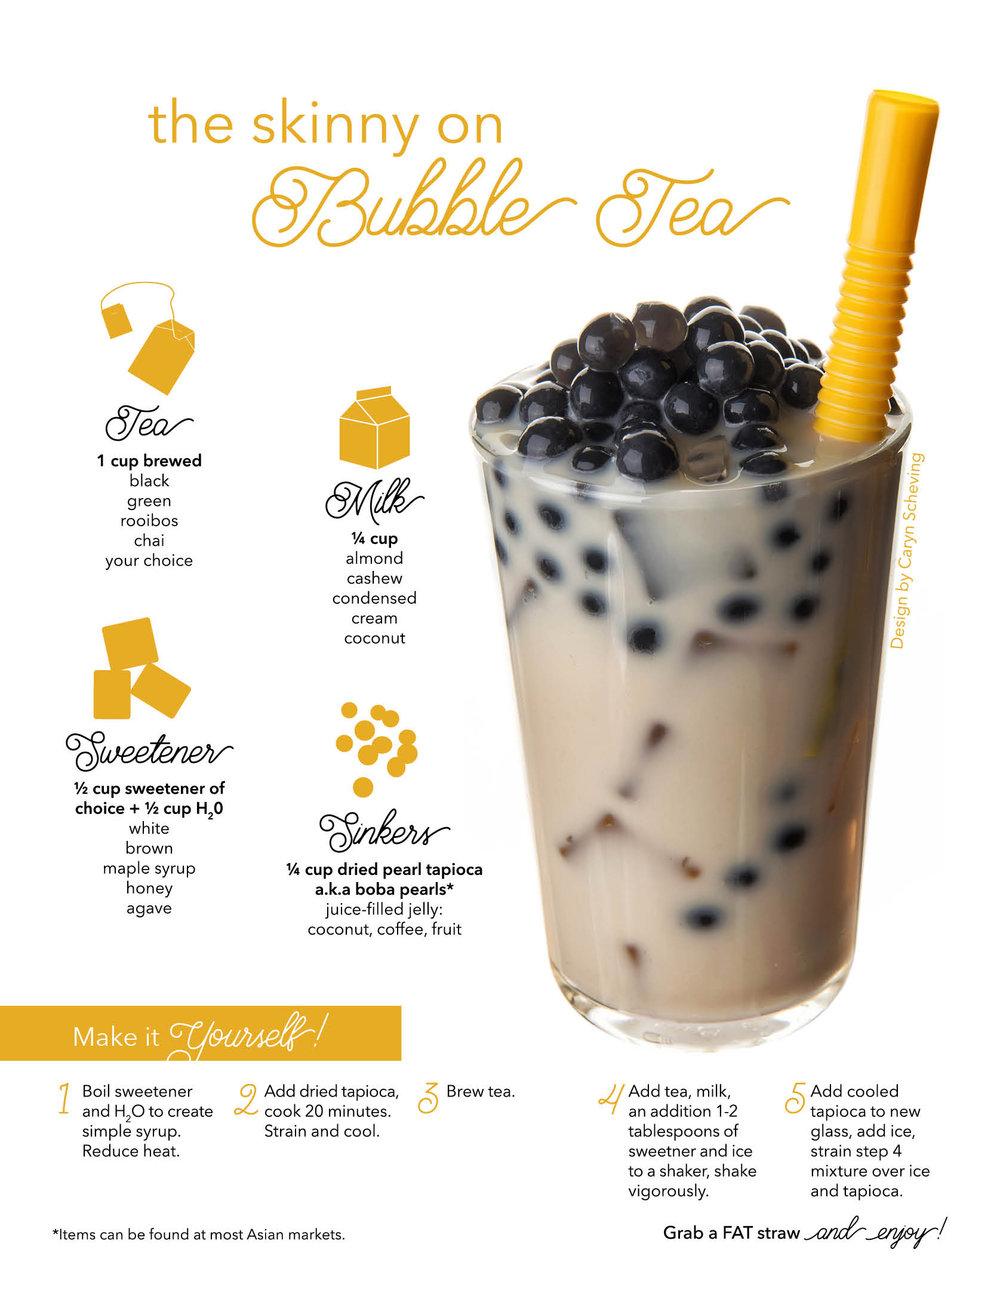 The Skinny on Bubble Tea